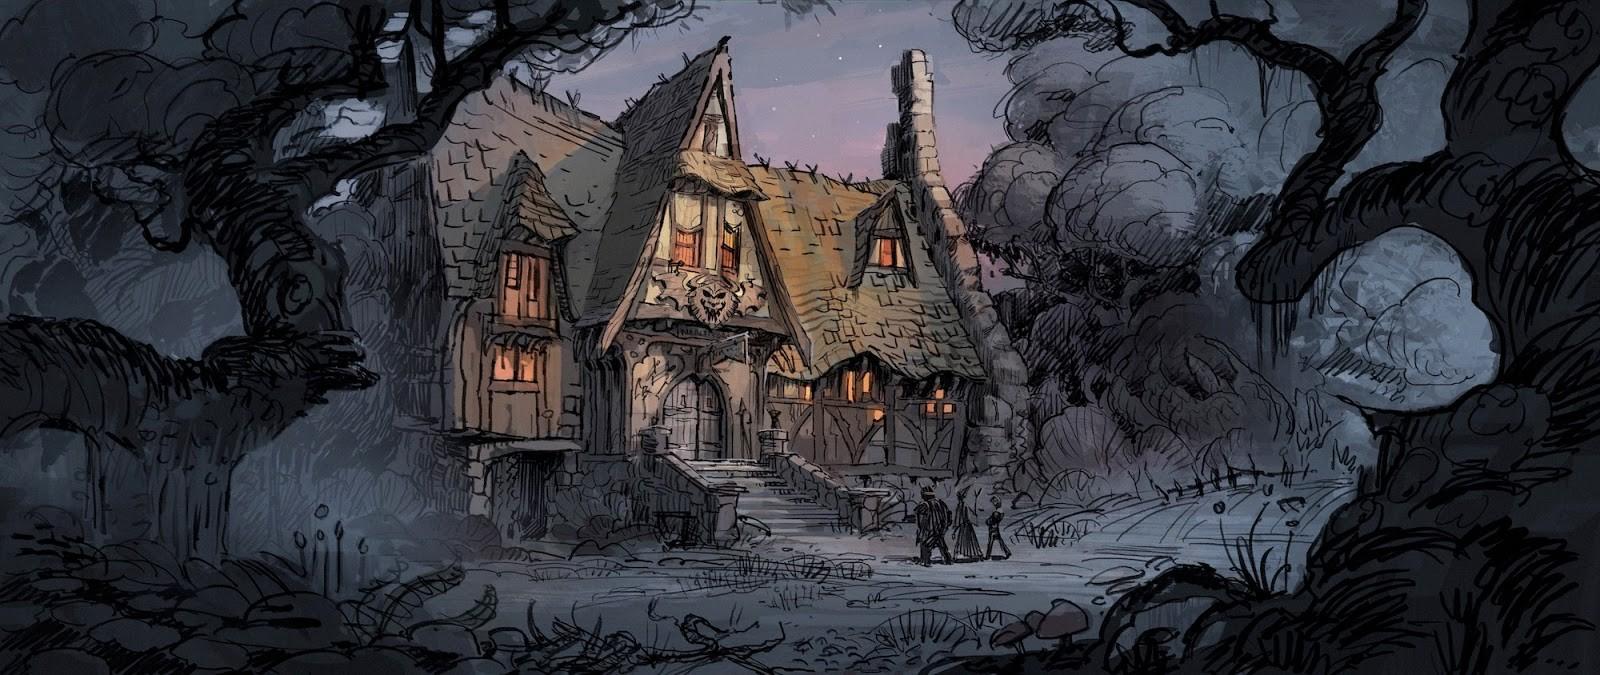 Manticore-Tavern-Pixar-Onward-Garrett-Taylor.jpg